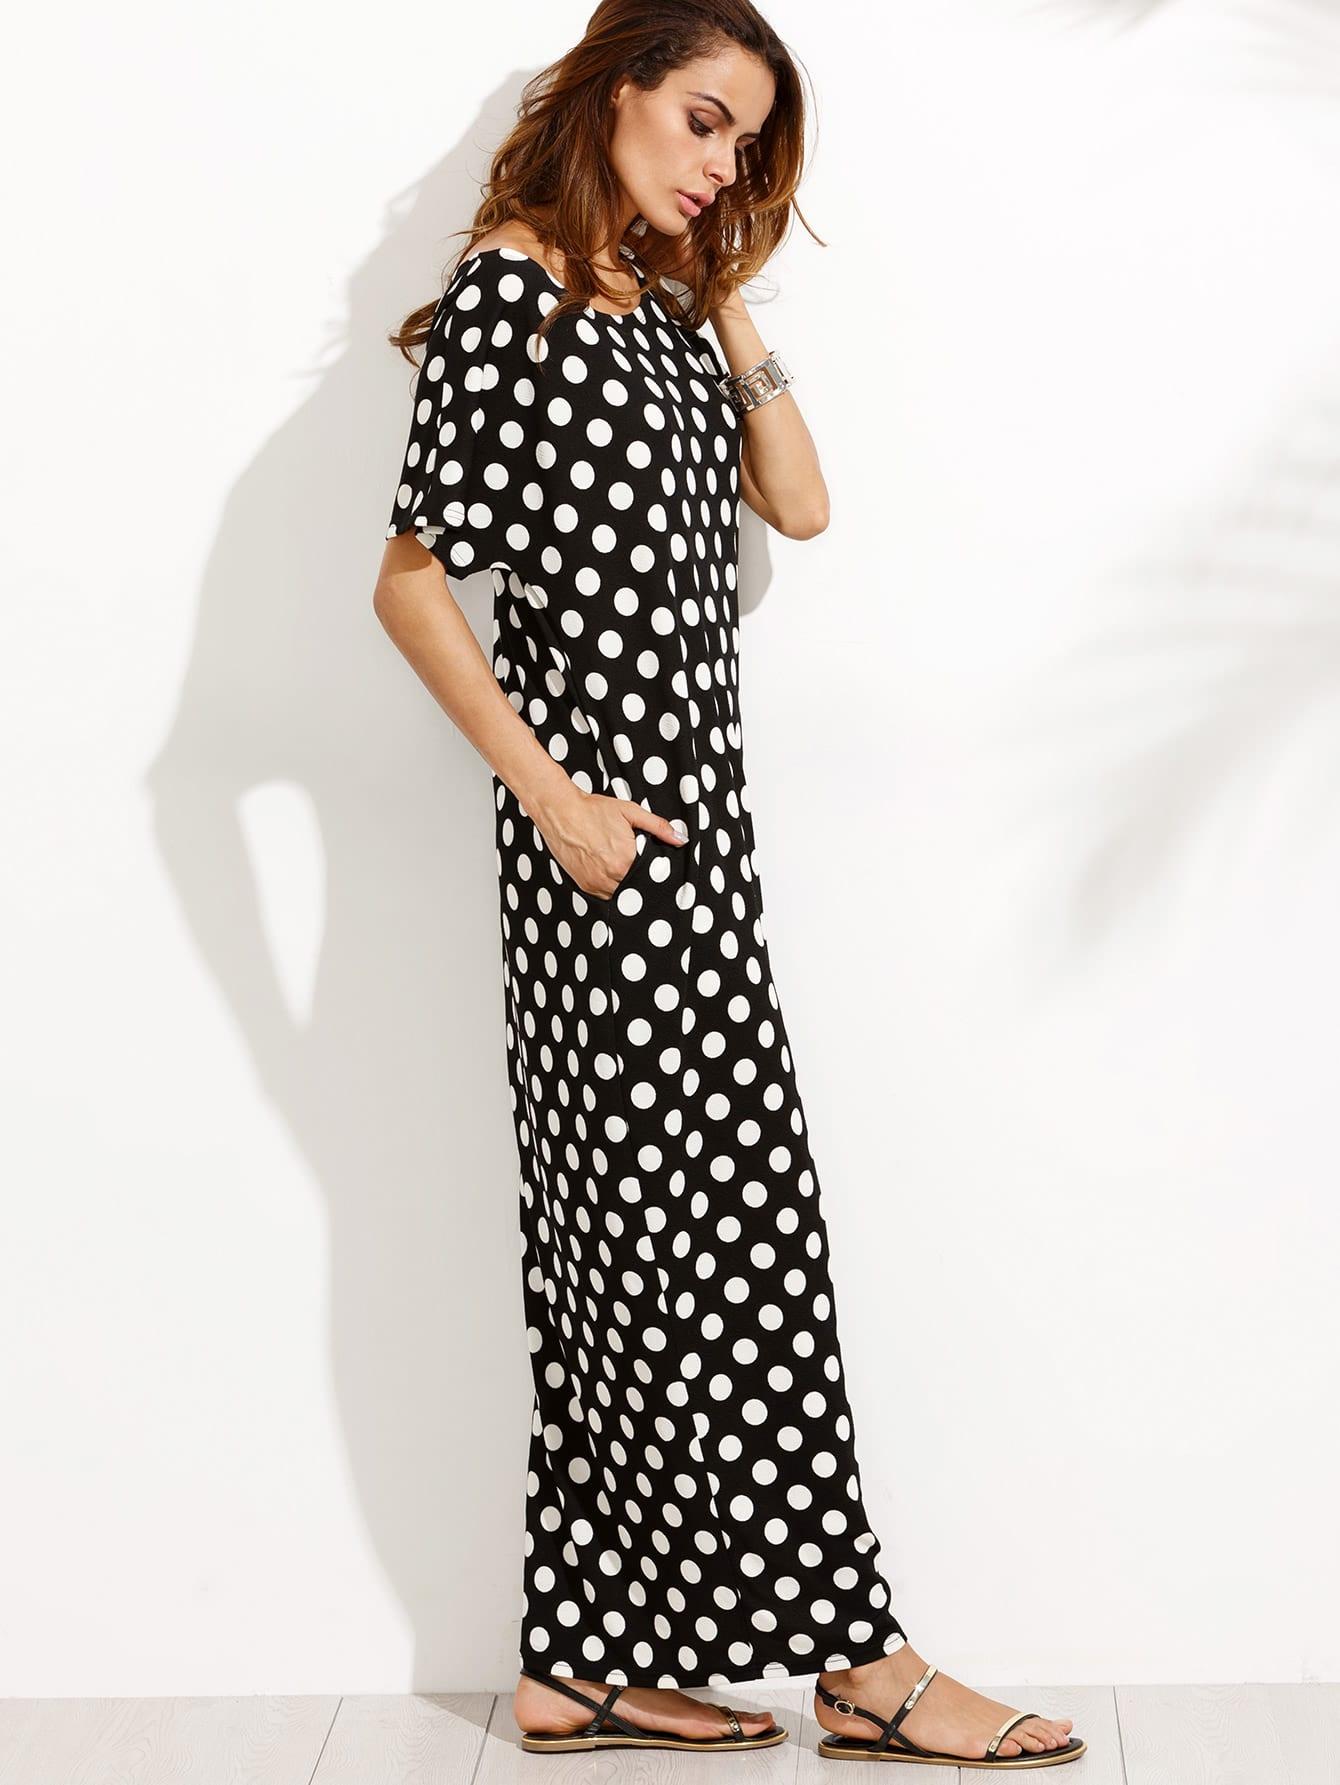 Black and White Polka Dot Pocket Maxi Dress